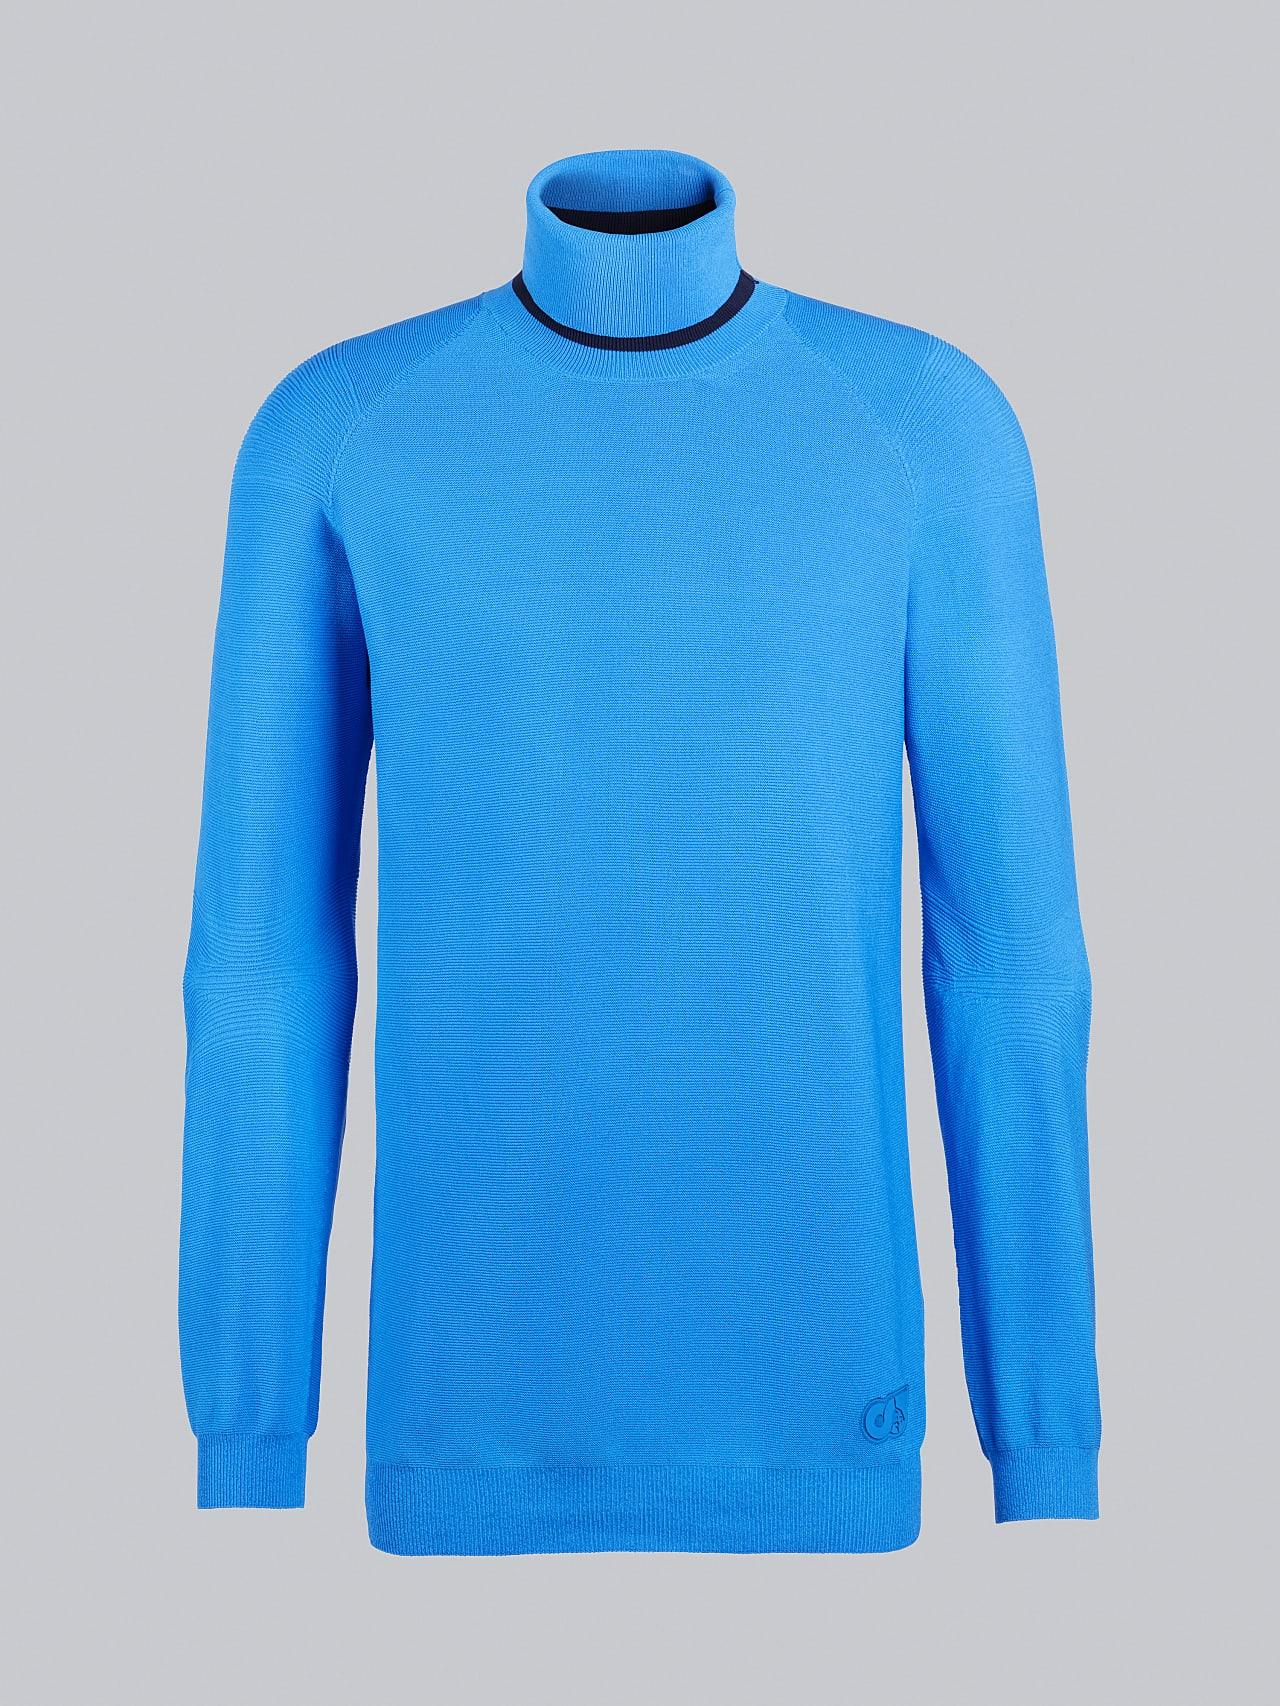 FUZZO V1.Y5.02 Seamless 3D Knit Roll-Neck Jumper blue Back Alpha Tauri